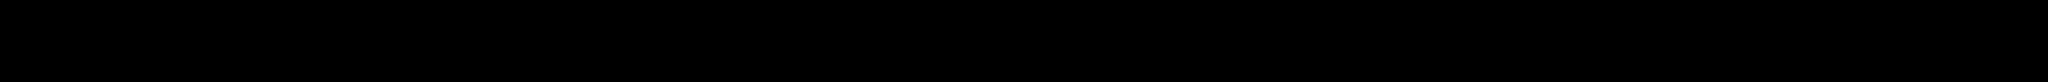 CALORSTAT by Vernet 40242801, 22630-00Q1D, 22630-00QAE, 25240-00Q0B, 25240-00QAB Διακόπτης πίεσης λαδιού